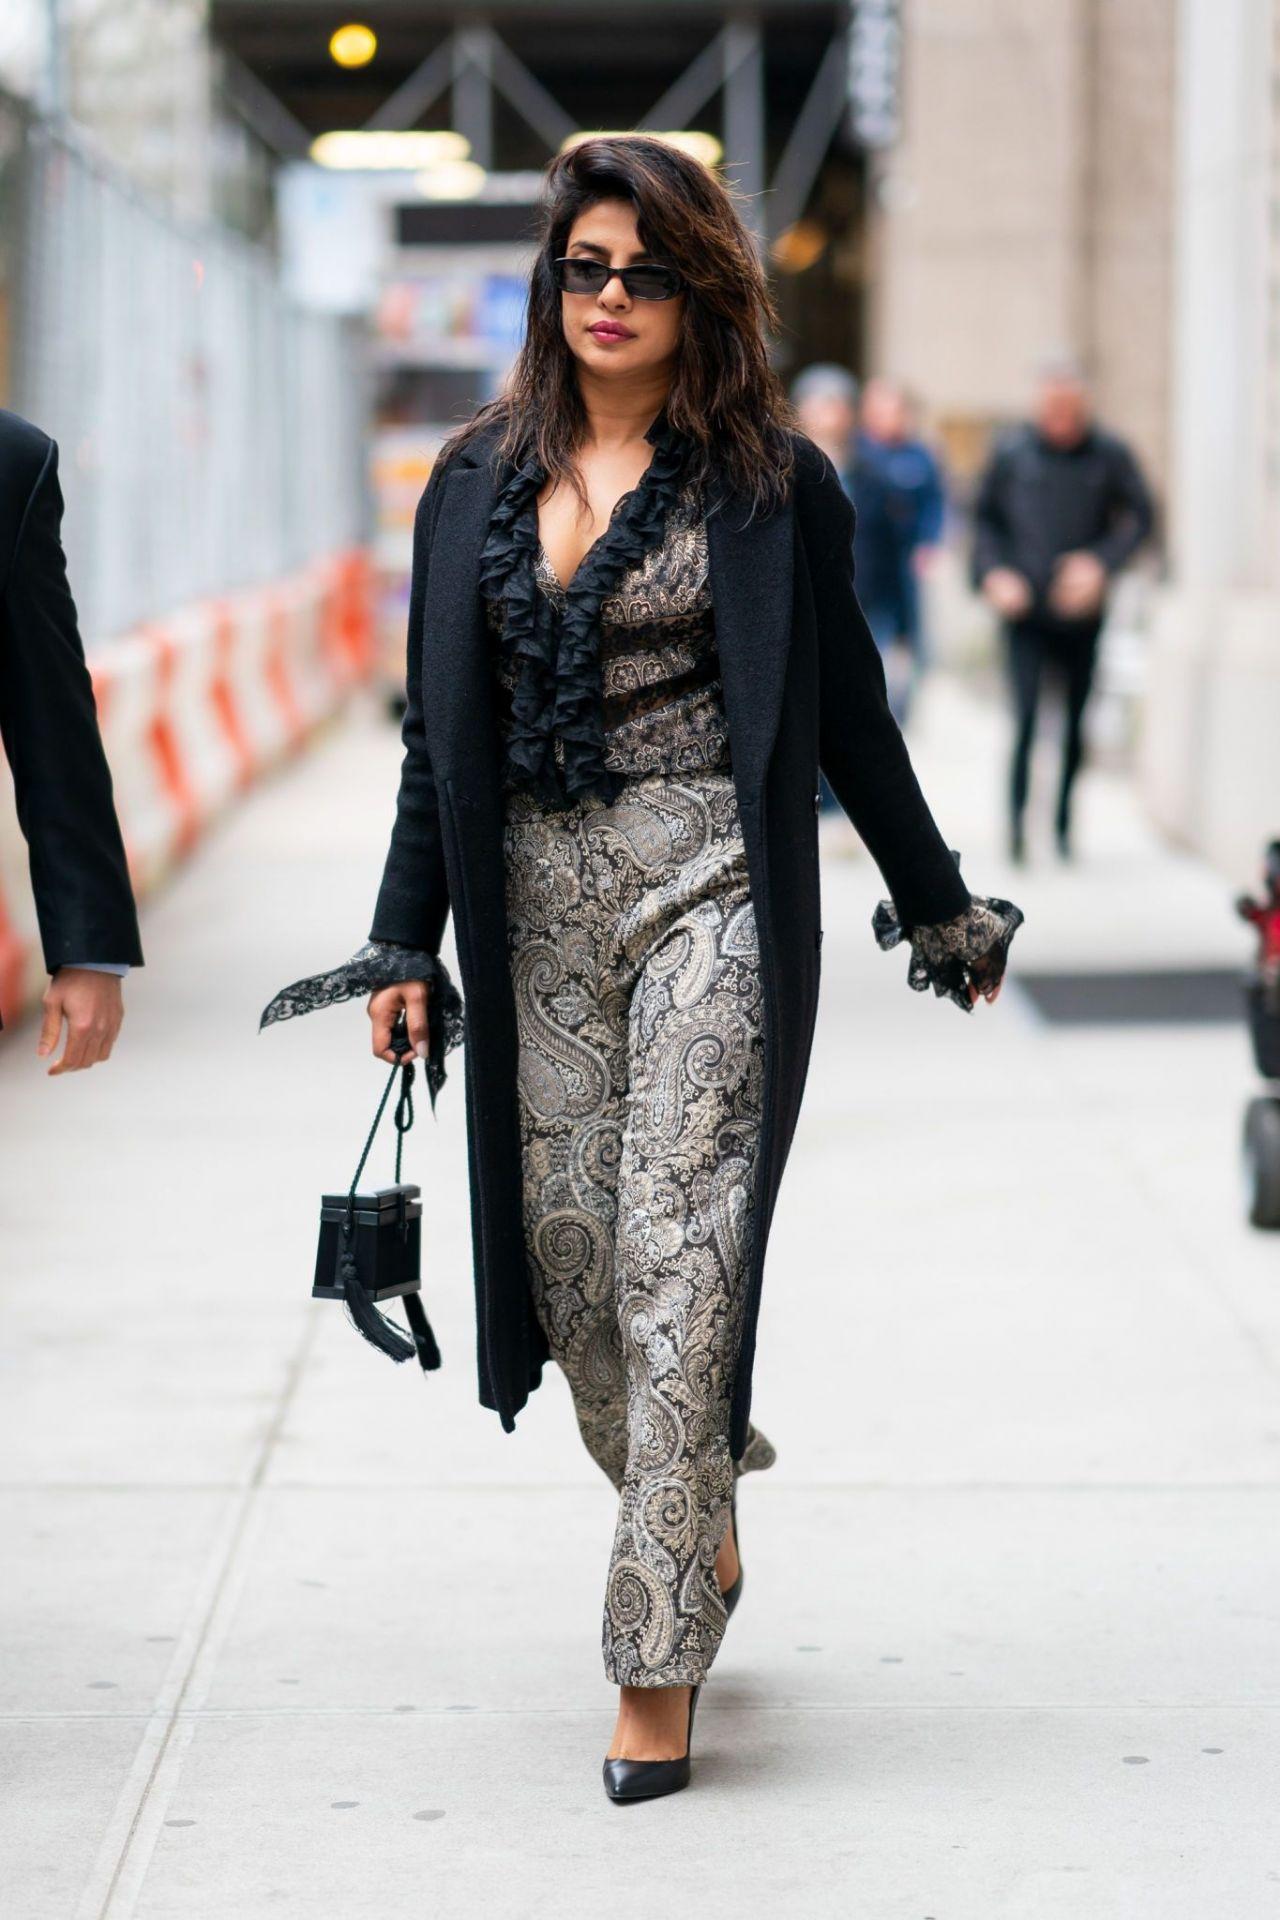 Priyanka Chopra Is Looking All Stylish Tribeca Nyc 04